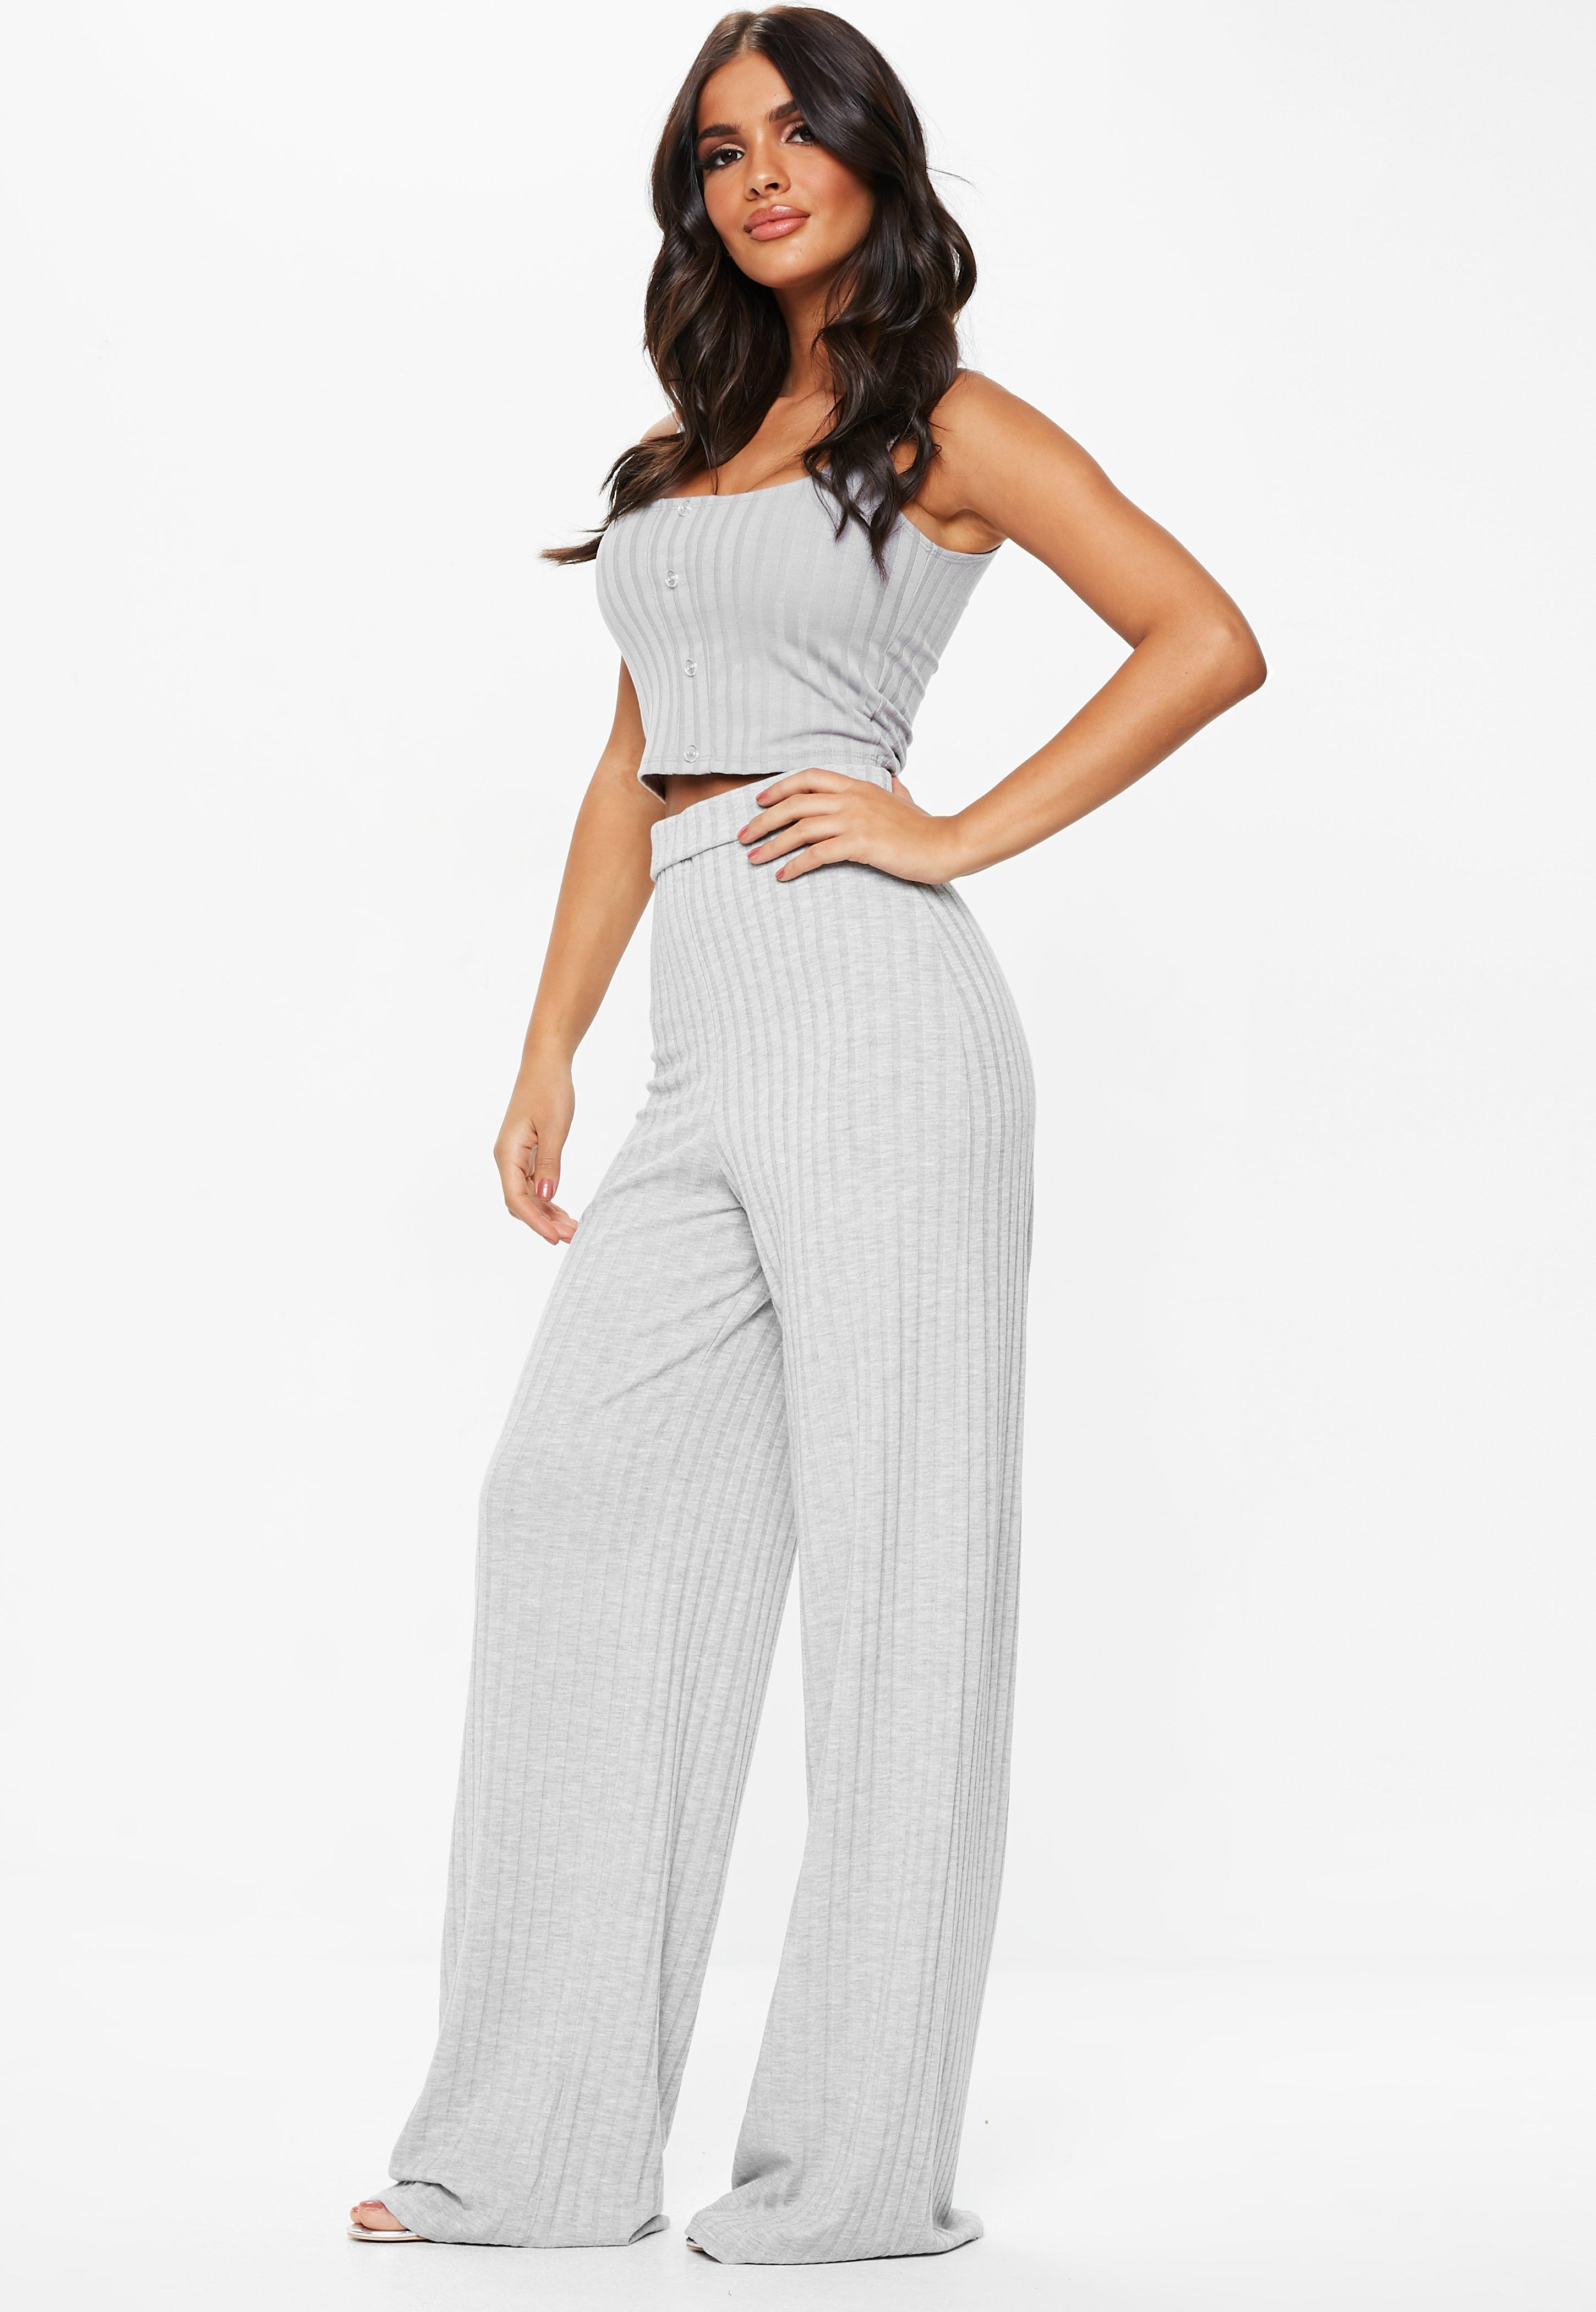 Pantalon tall pour femme - Missguided 2794ca556cd0